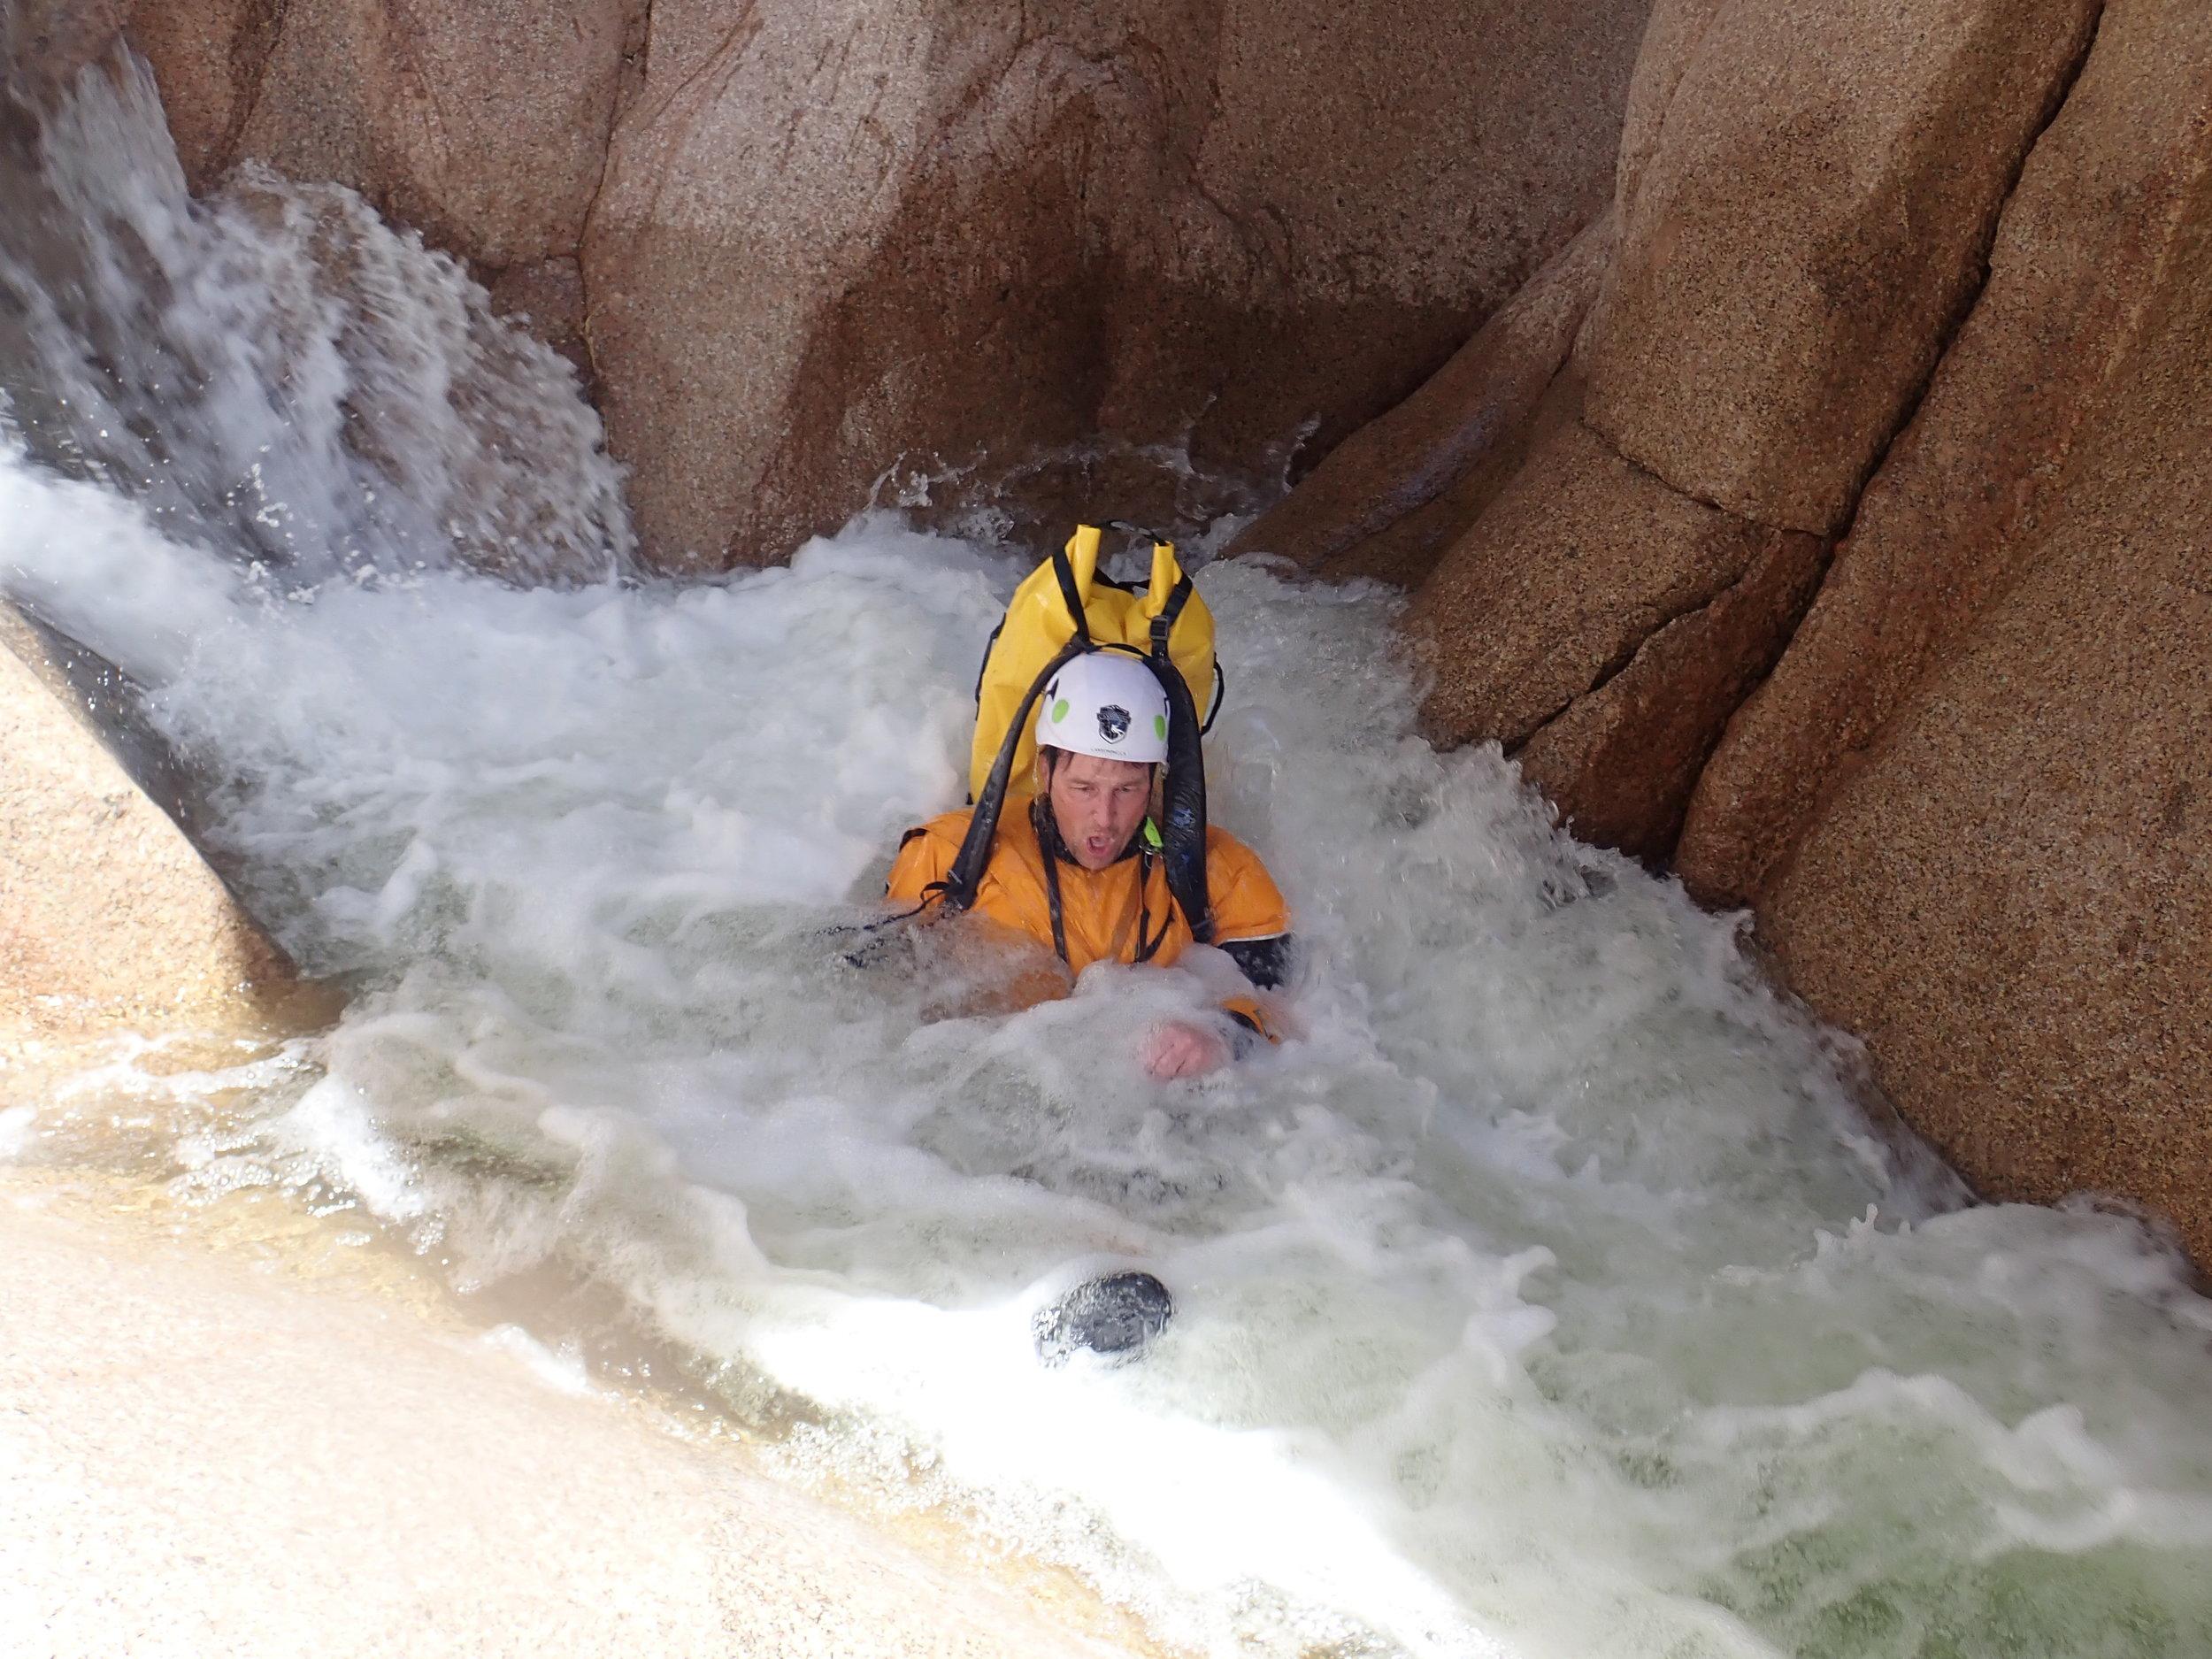 AZ Rendezvous - Salome Jug - April 11, 2019 AZ Rock and Canyon Adventures (56).JPG